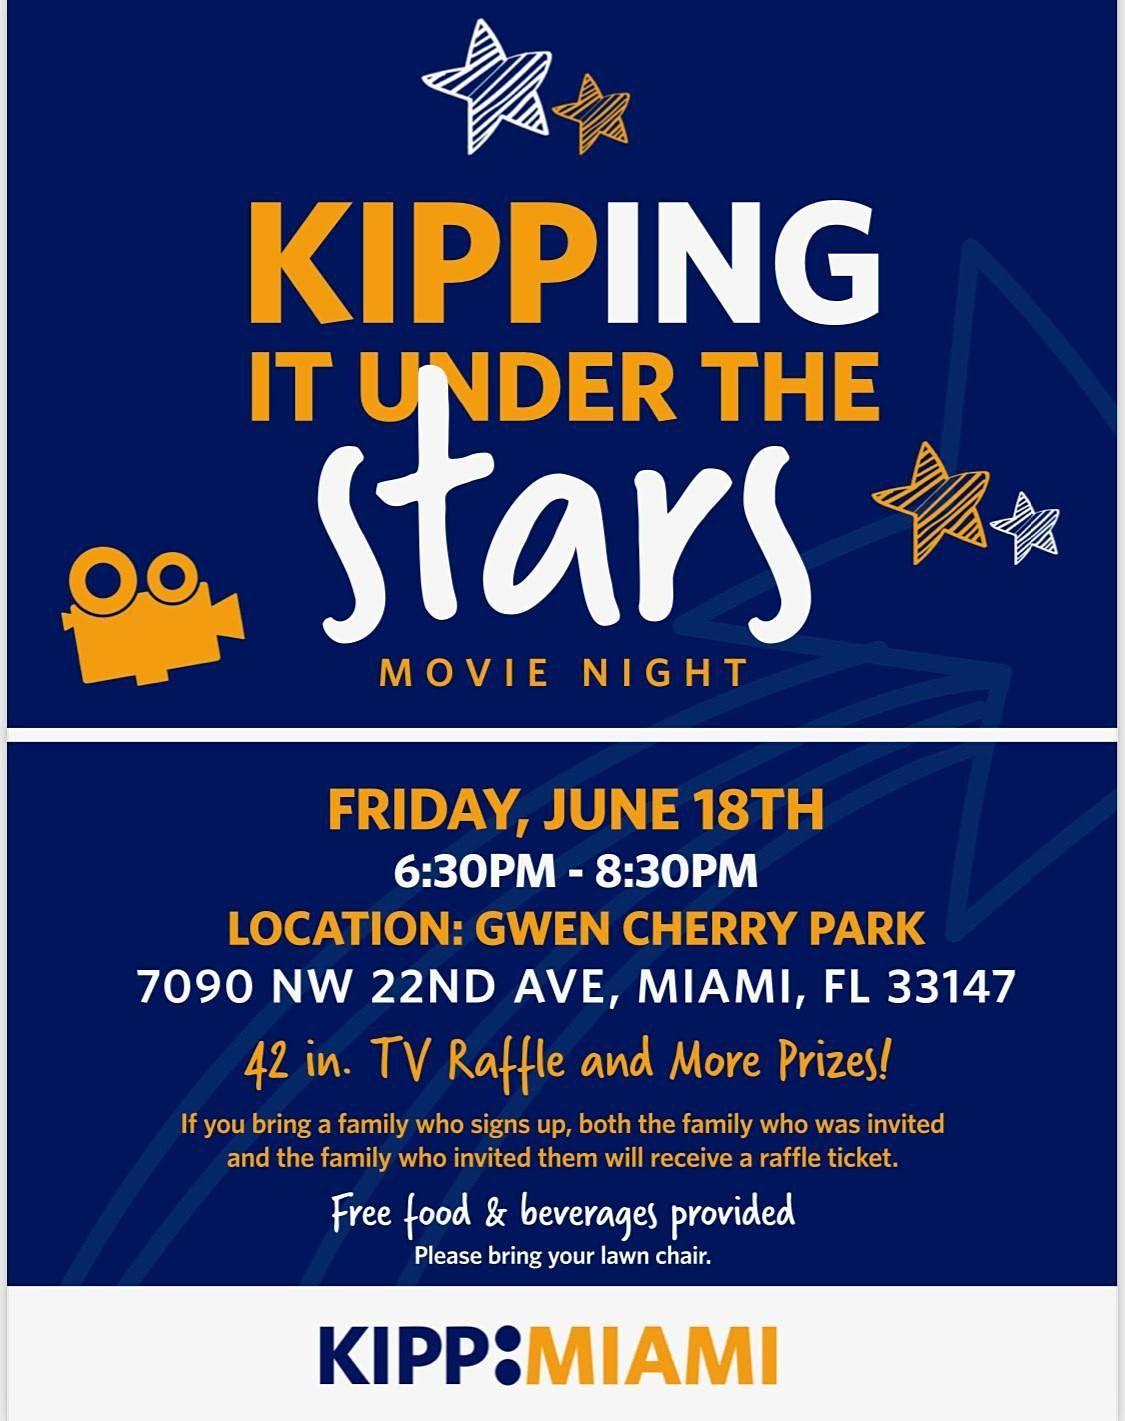 KIPPING  IT UNDER THE STARS